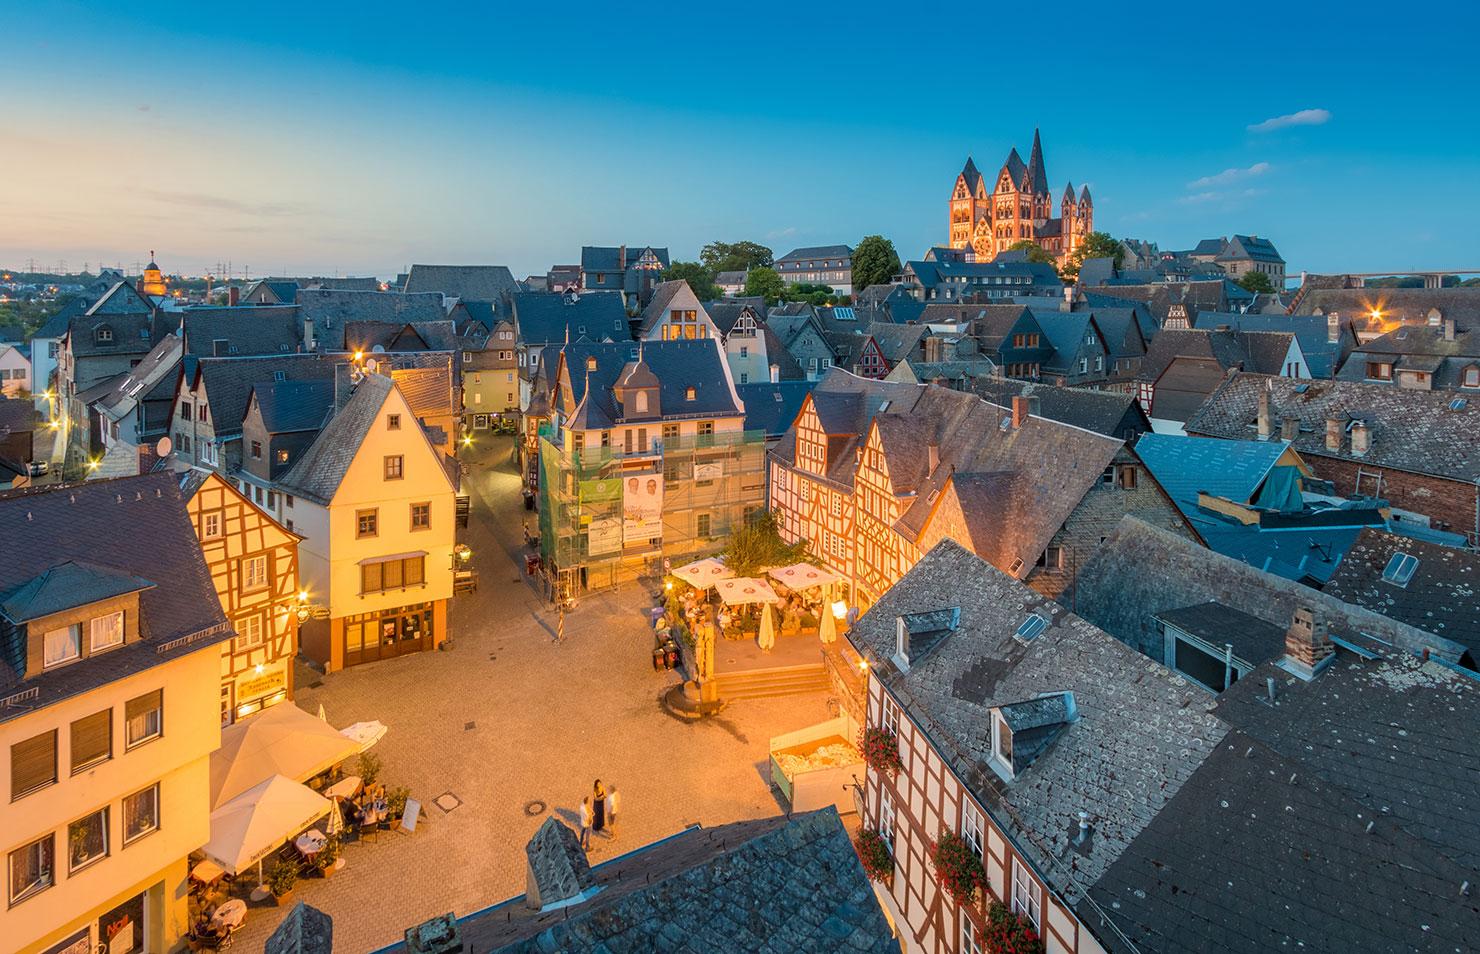 Limburg Altstadt Sommer blaue Stunde